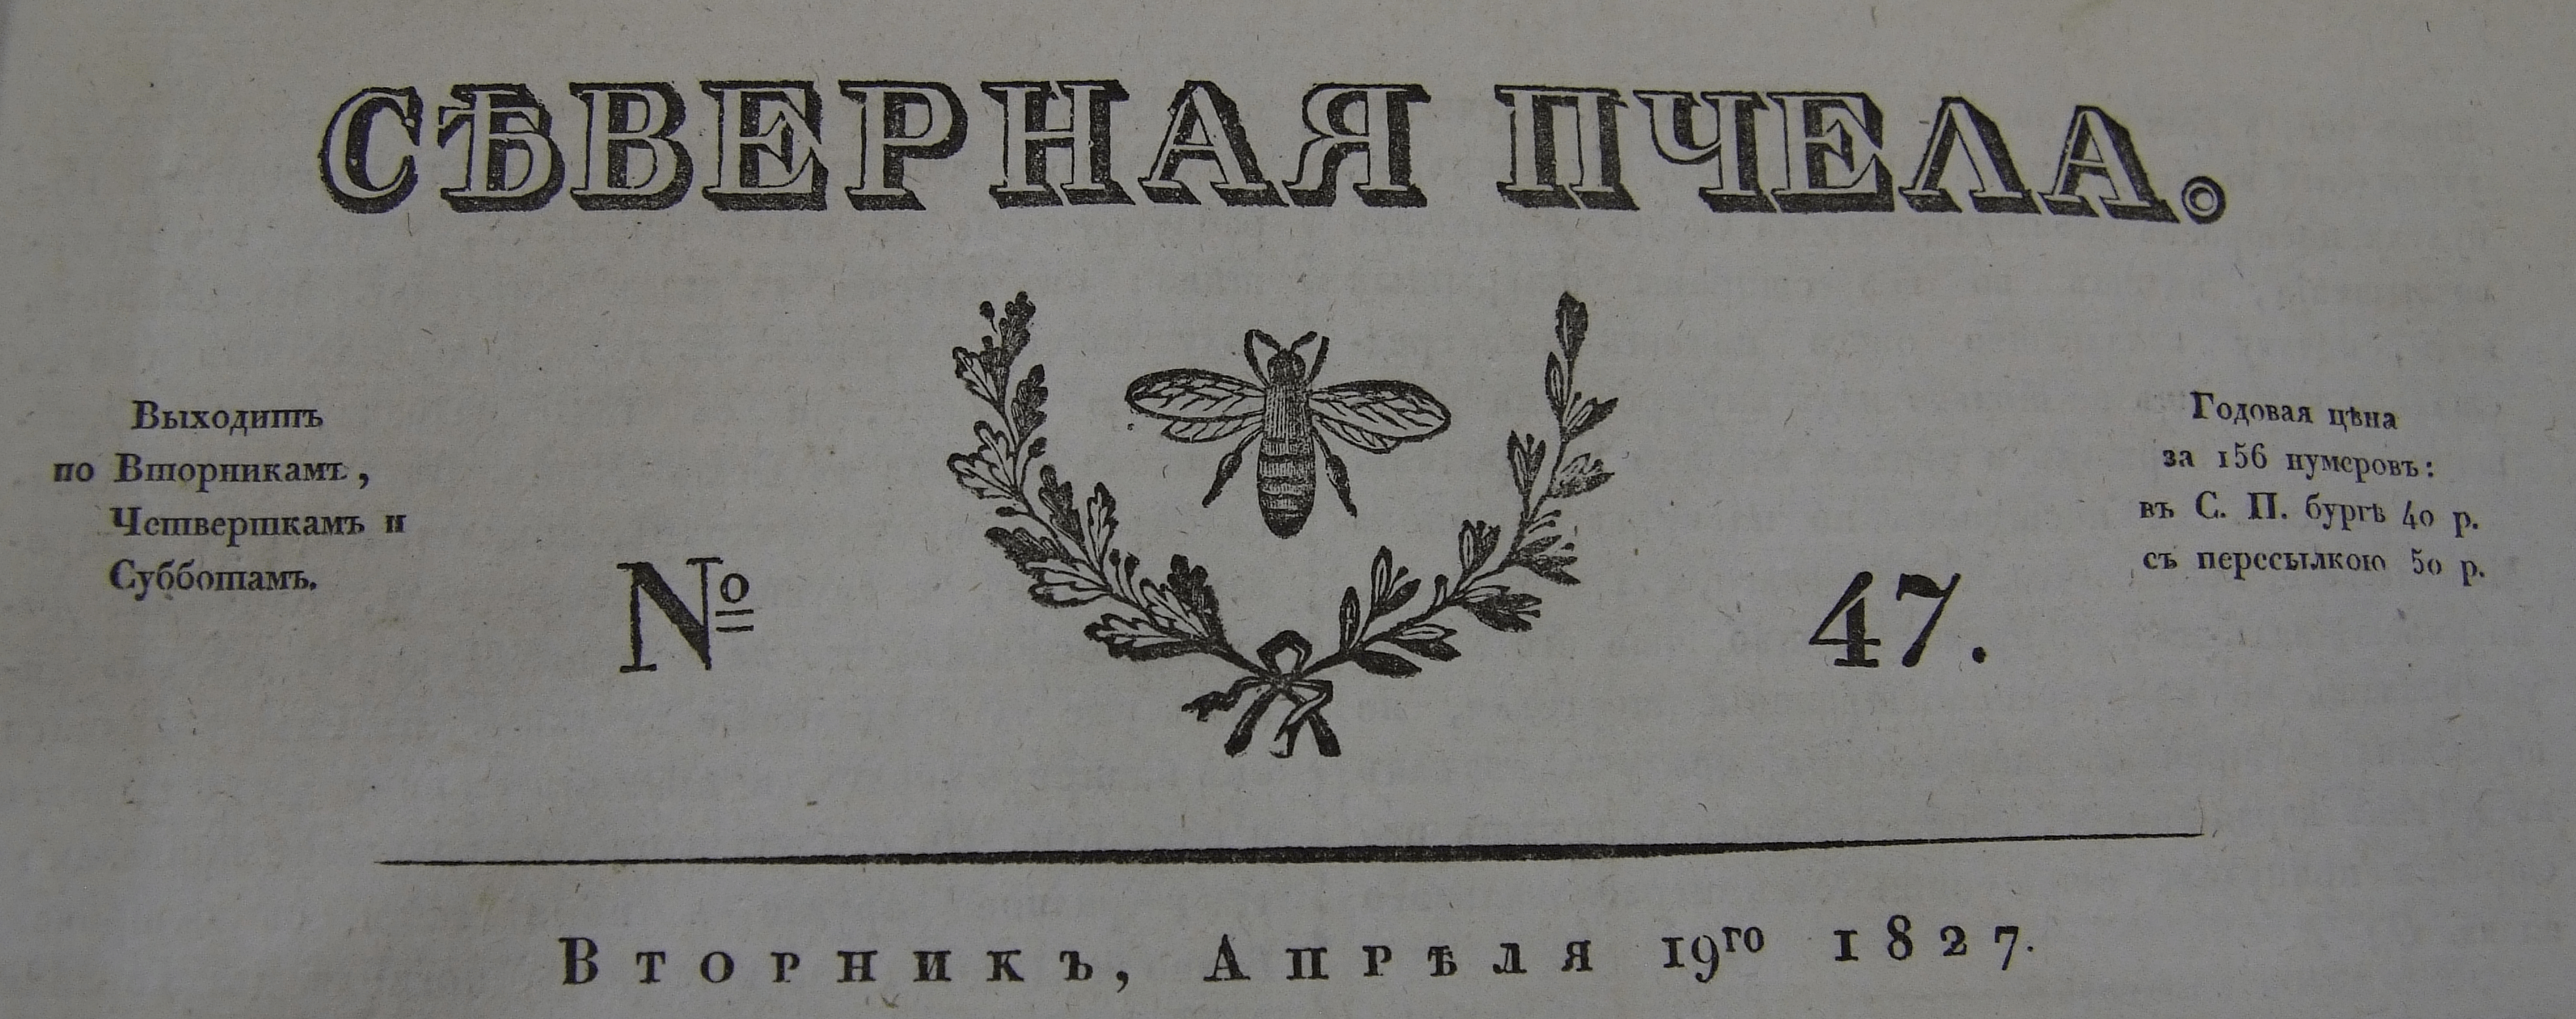 https://b1.culture.ru/c/742610/SevPchela.JPG